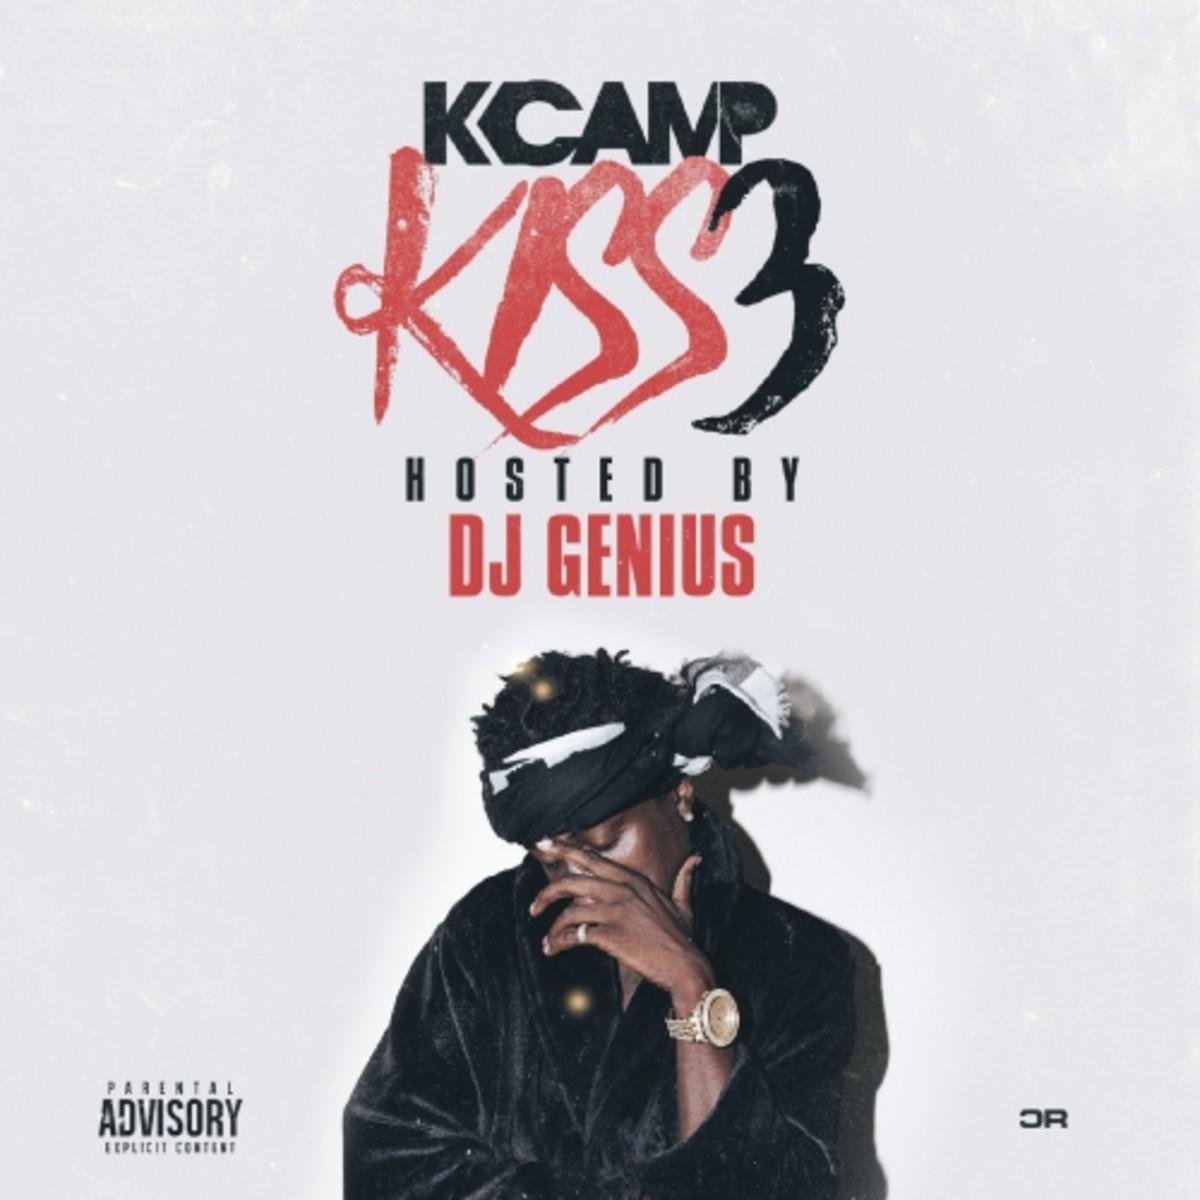 k-camp-kiss-3.jpg